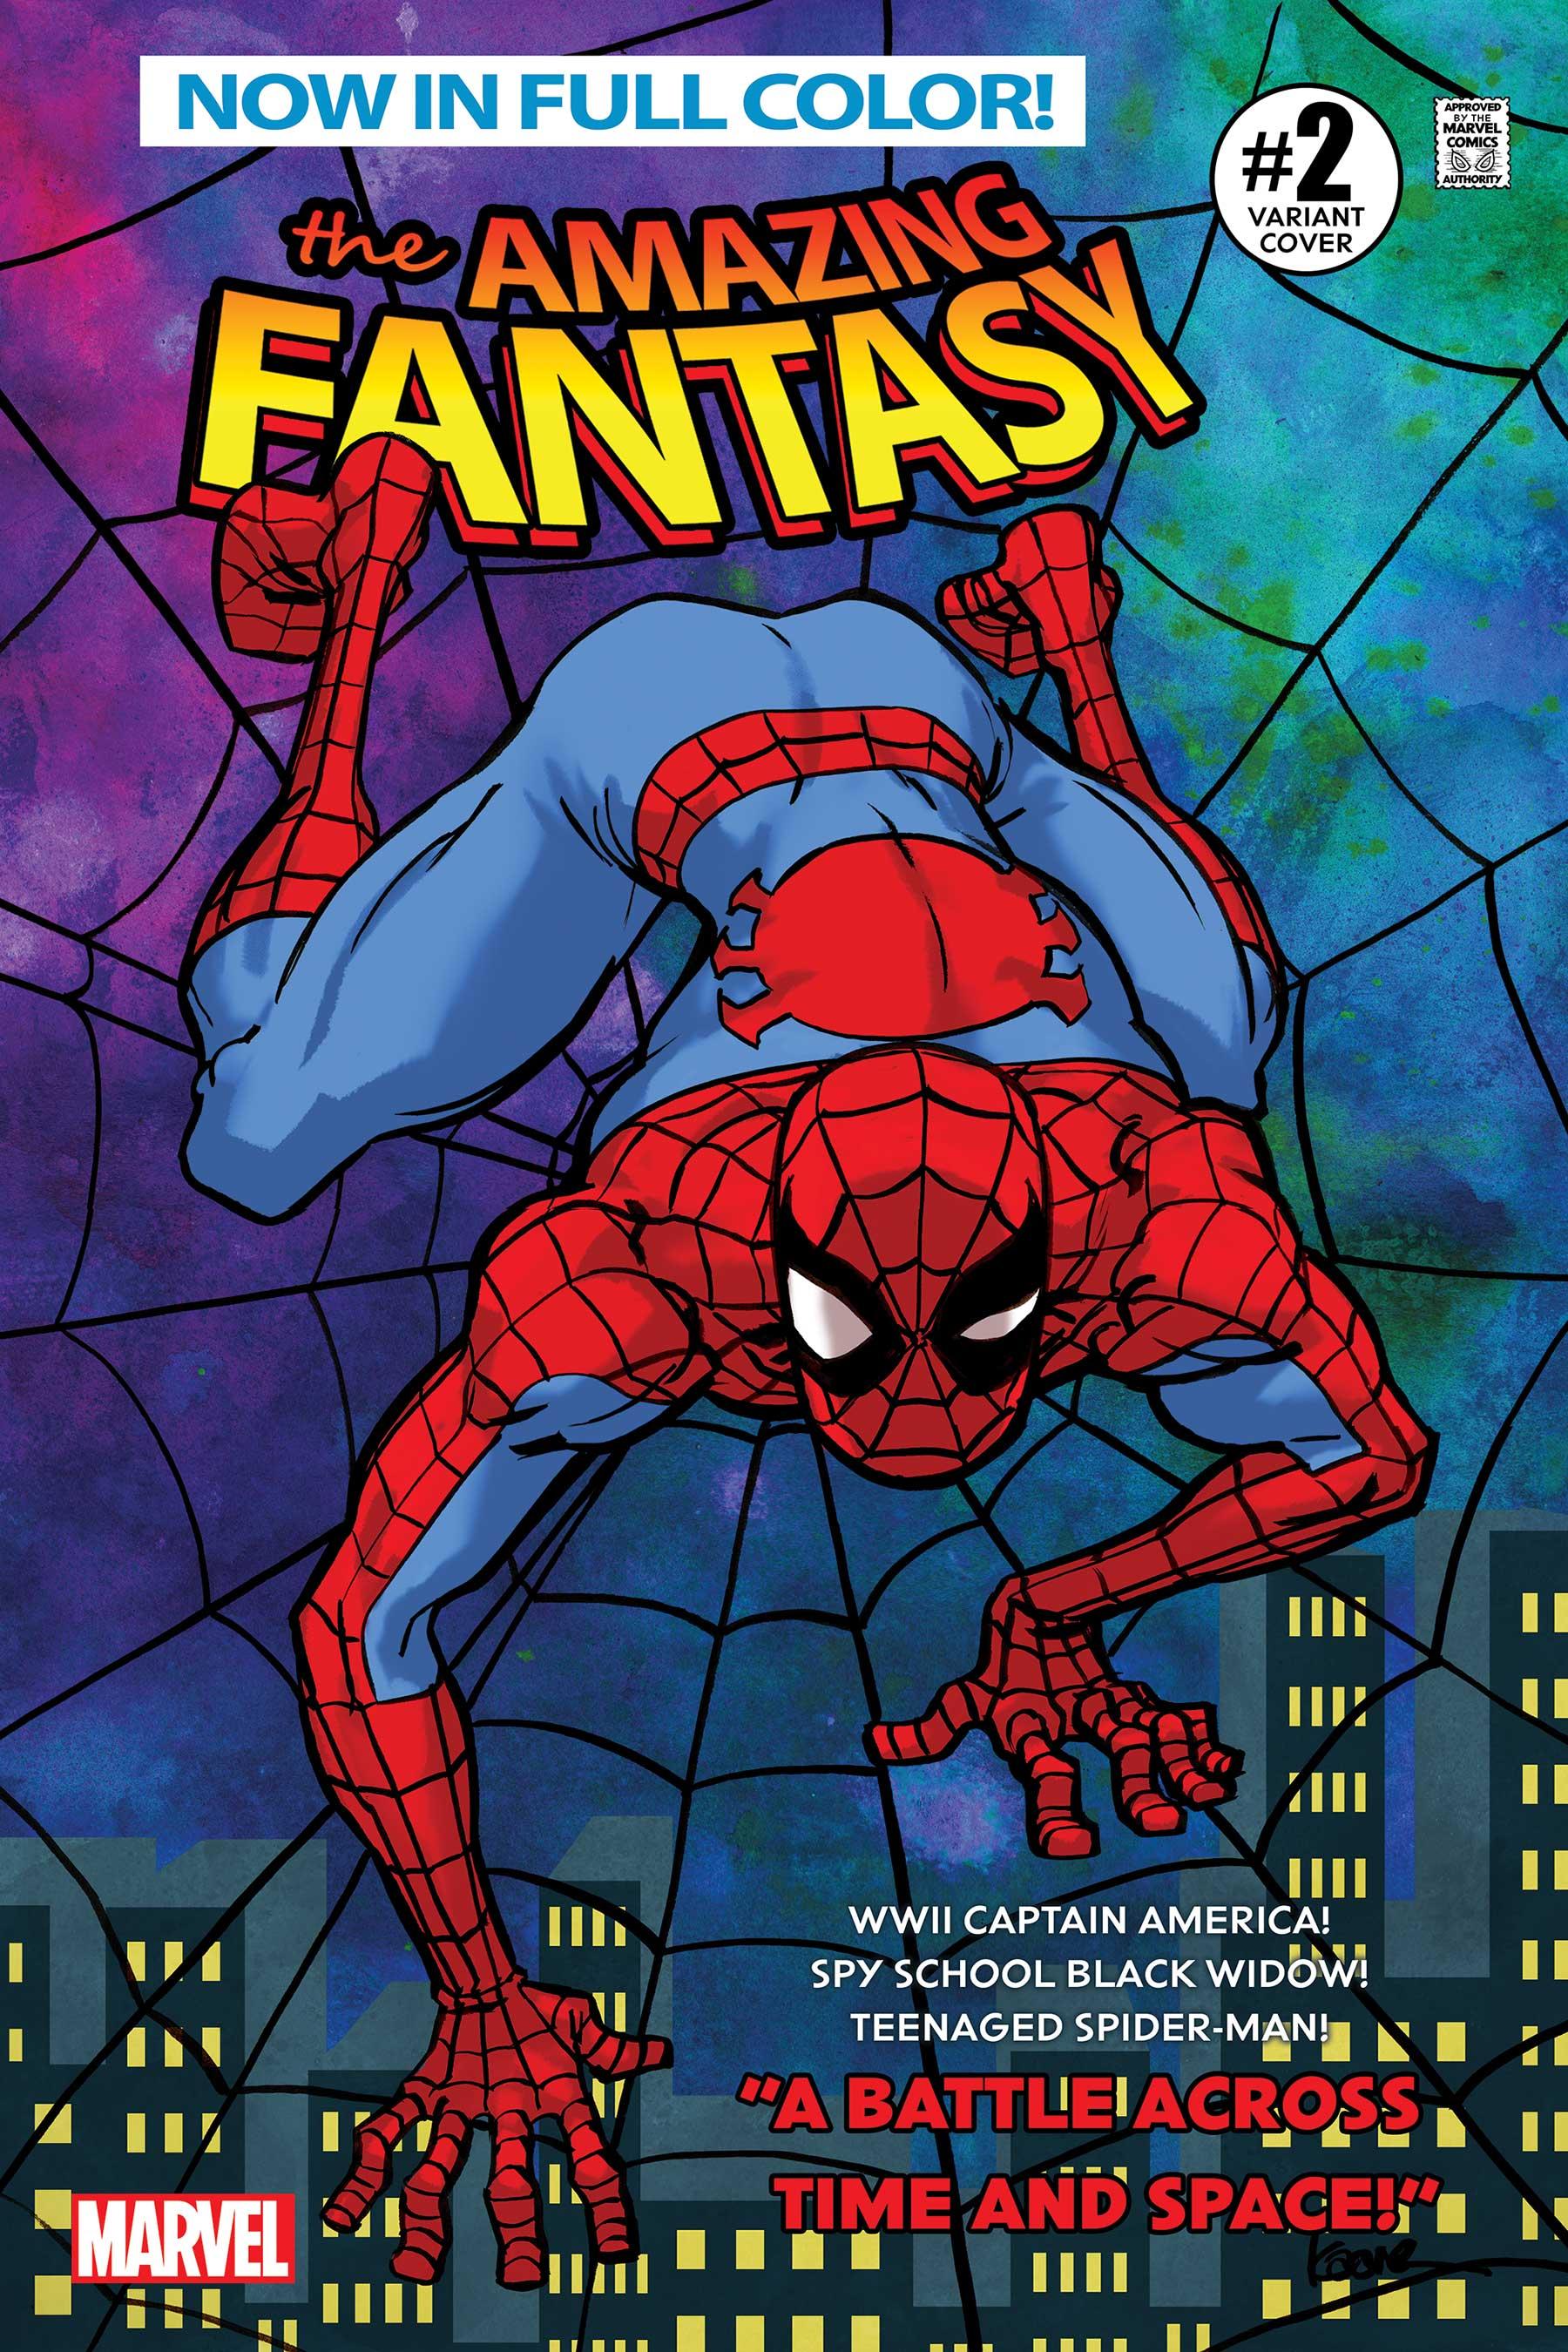 Amazing Fantasy (2021) #2 (Variant)